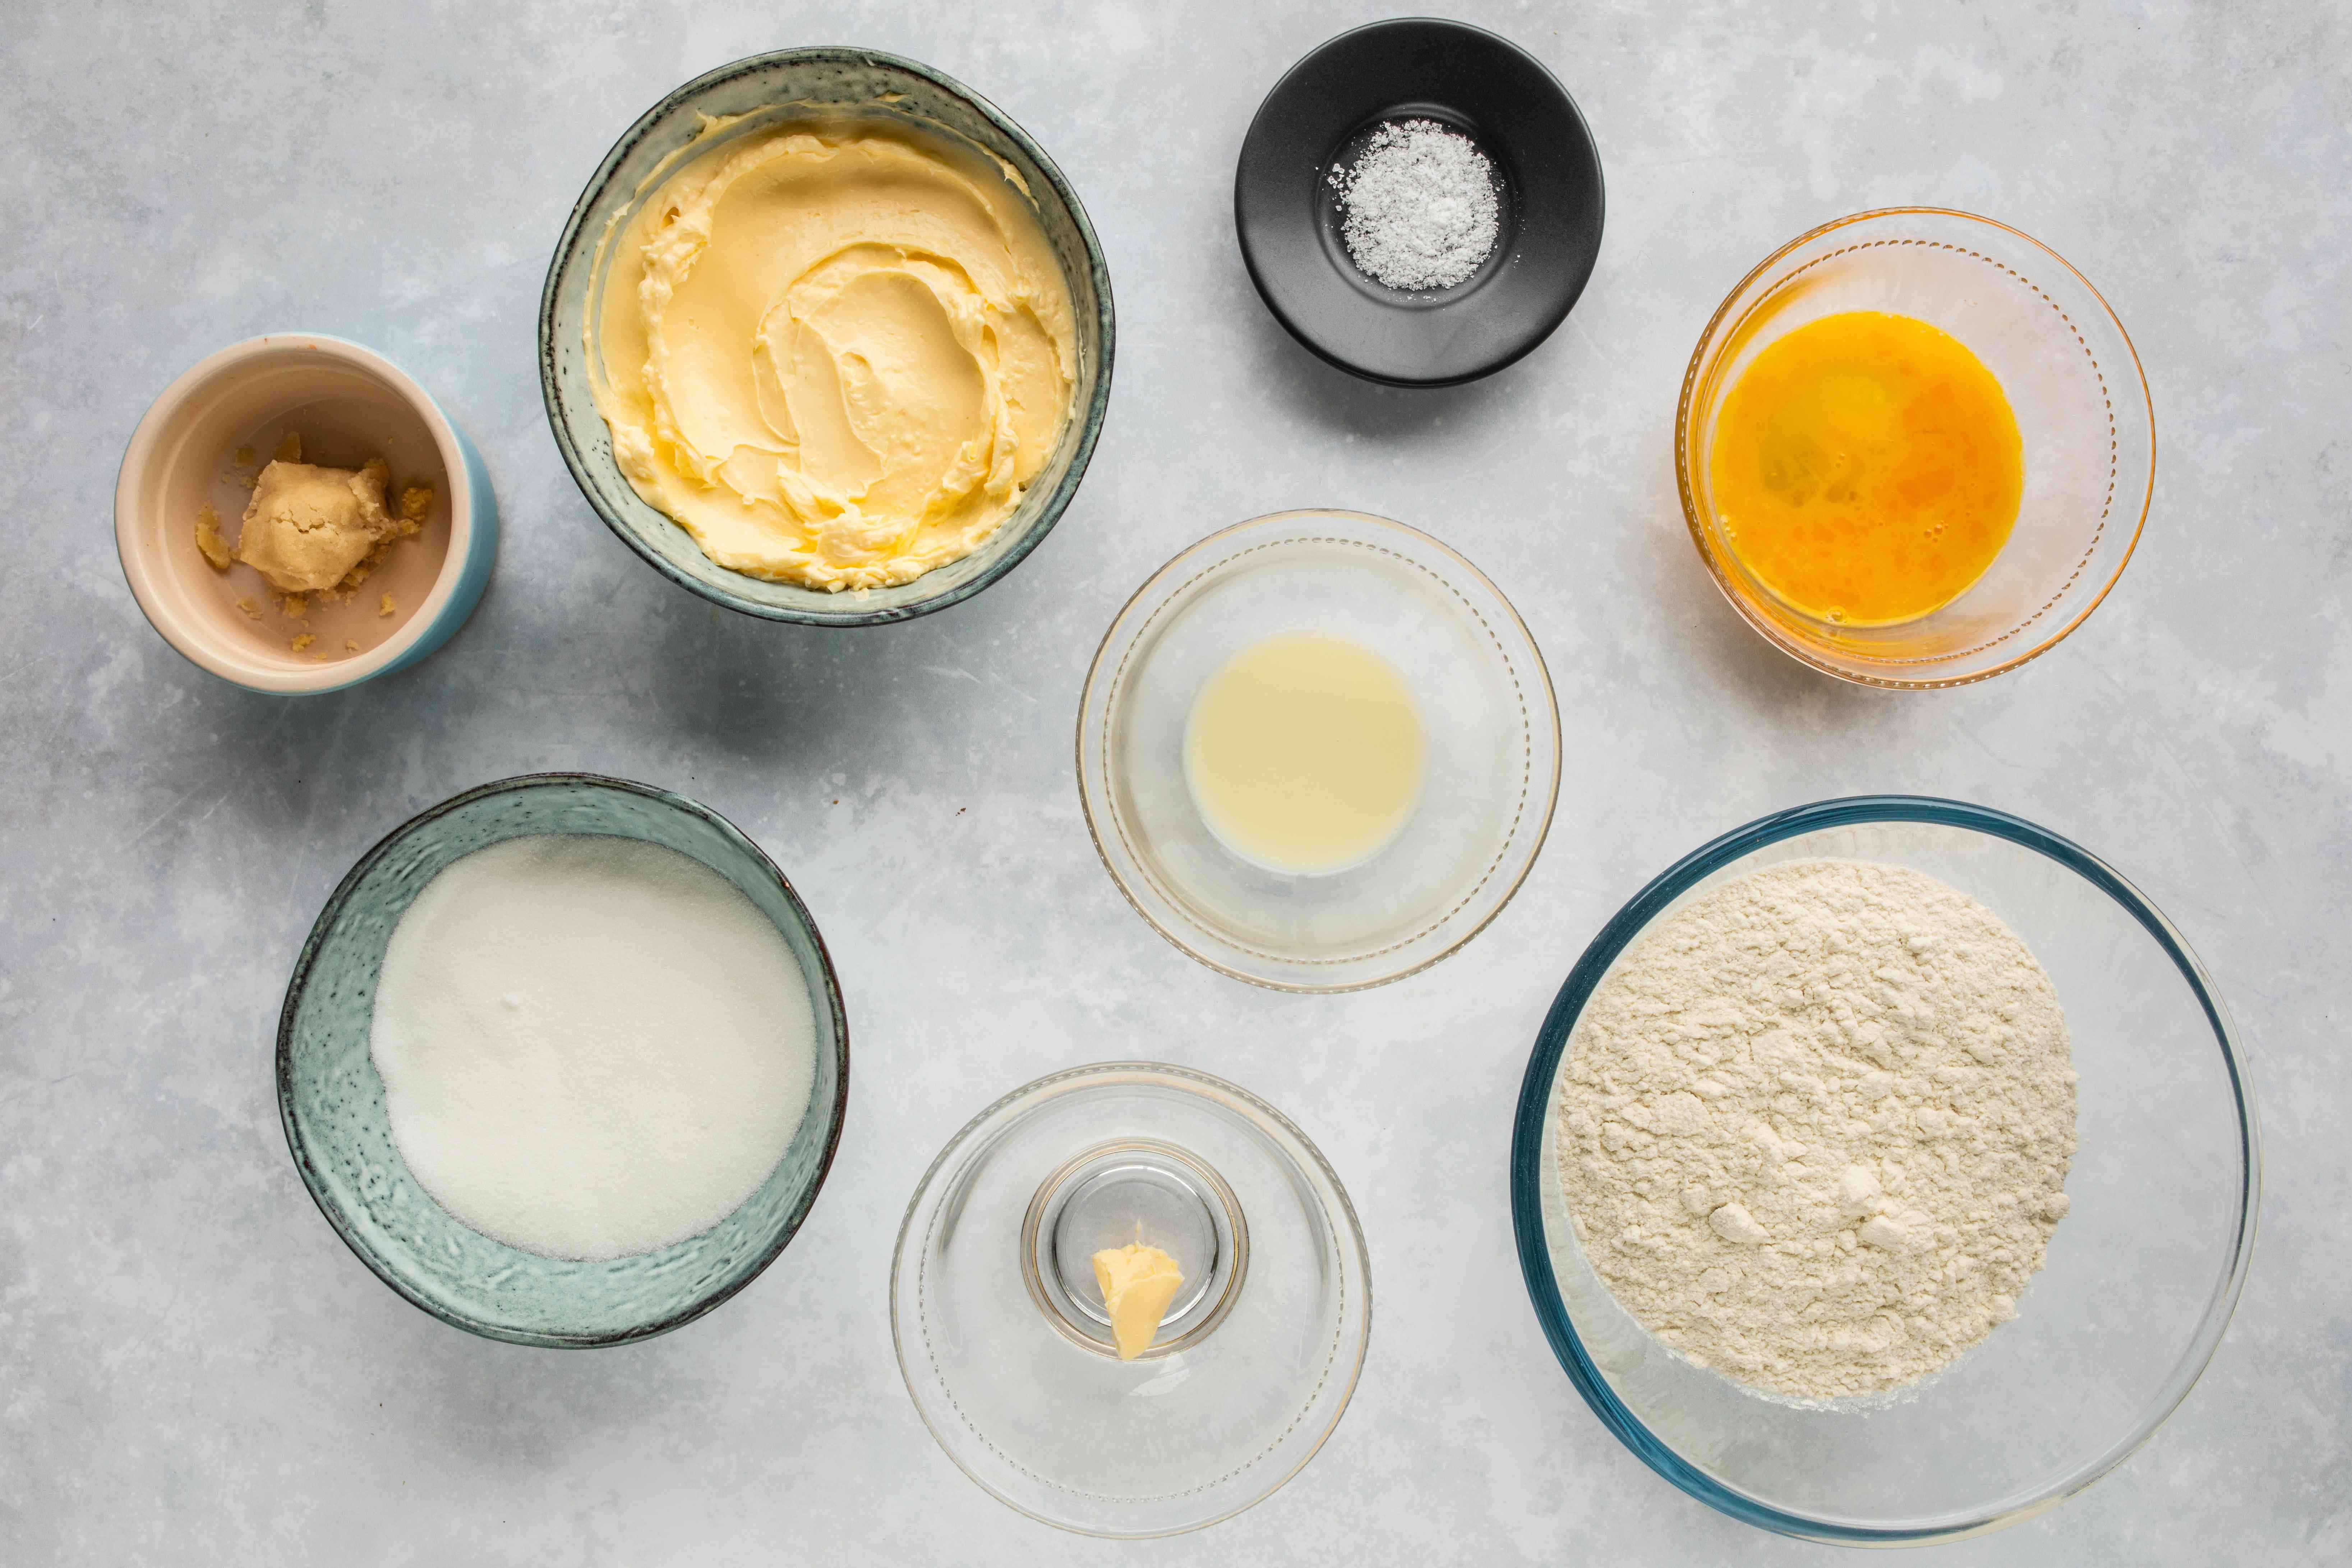 Dutch stroopwafels dough ingredients